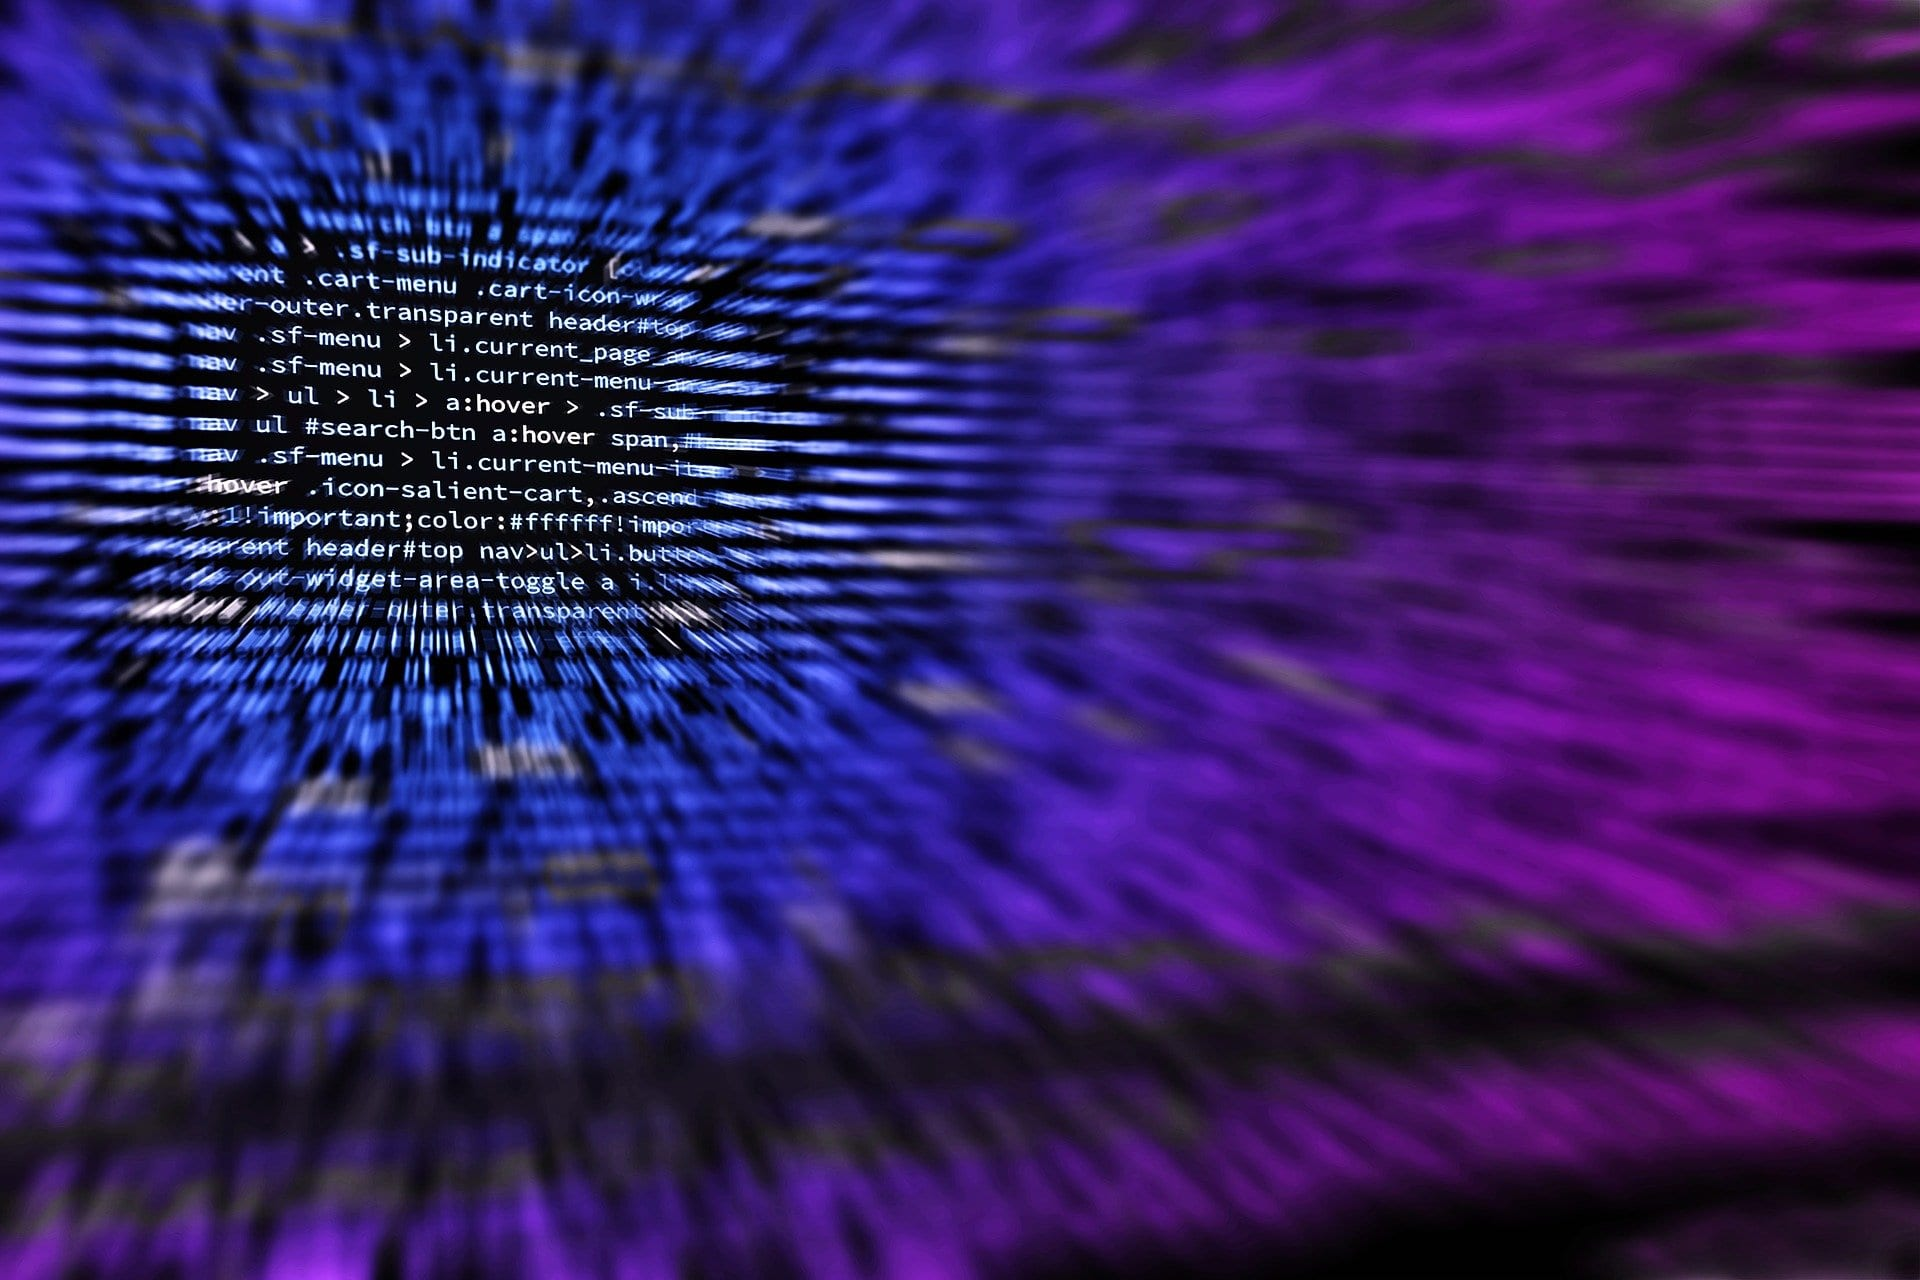 L'hacker di Verkada rischia ora 20 anni di prigione negli USA